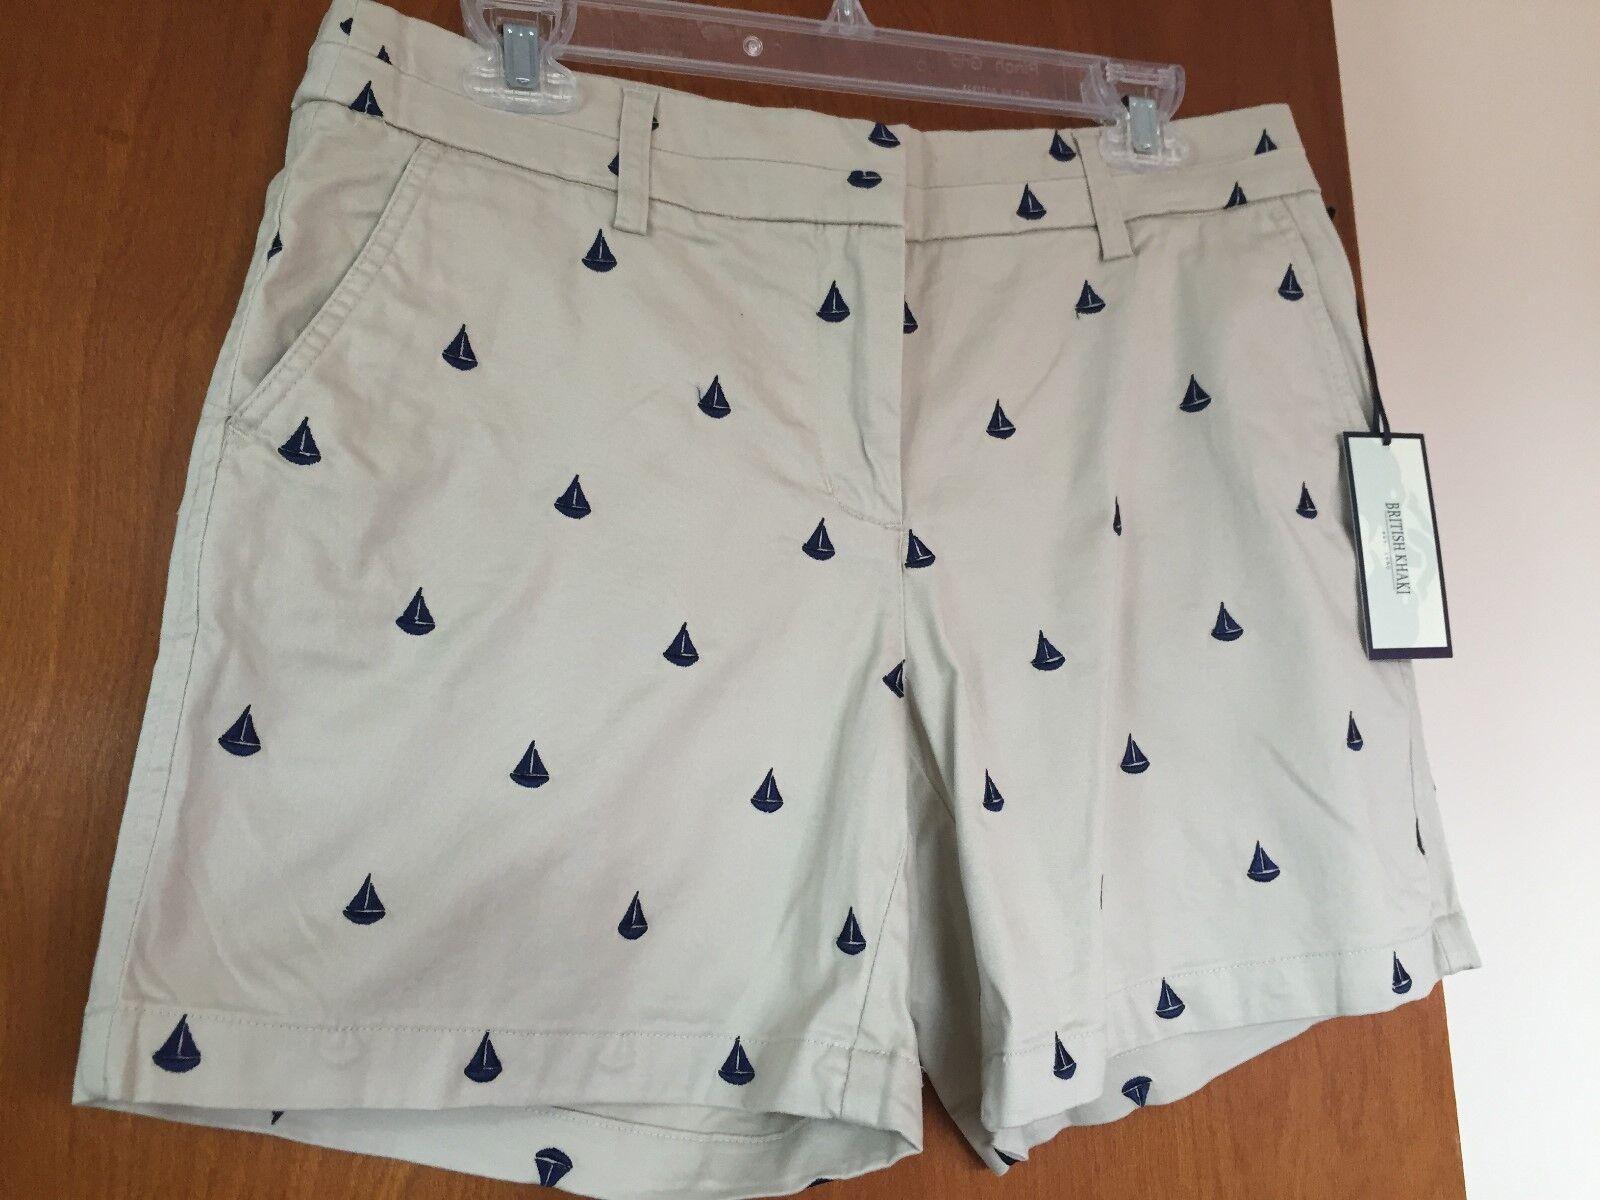 New British Khaki Shorts Cotton Spandex Light Brown Navy bluee Flat Size 8,